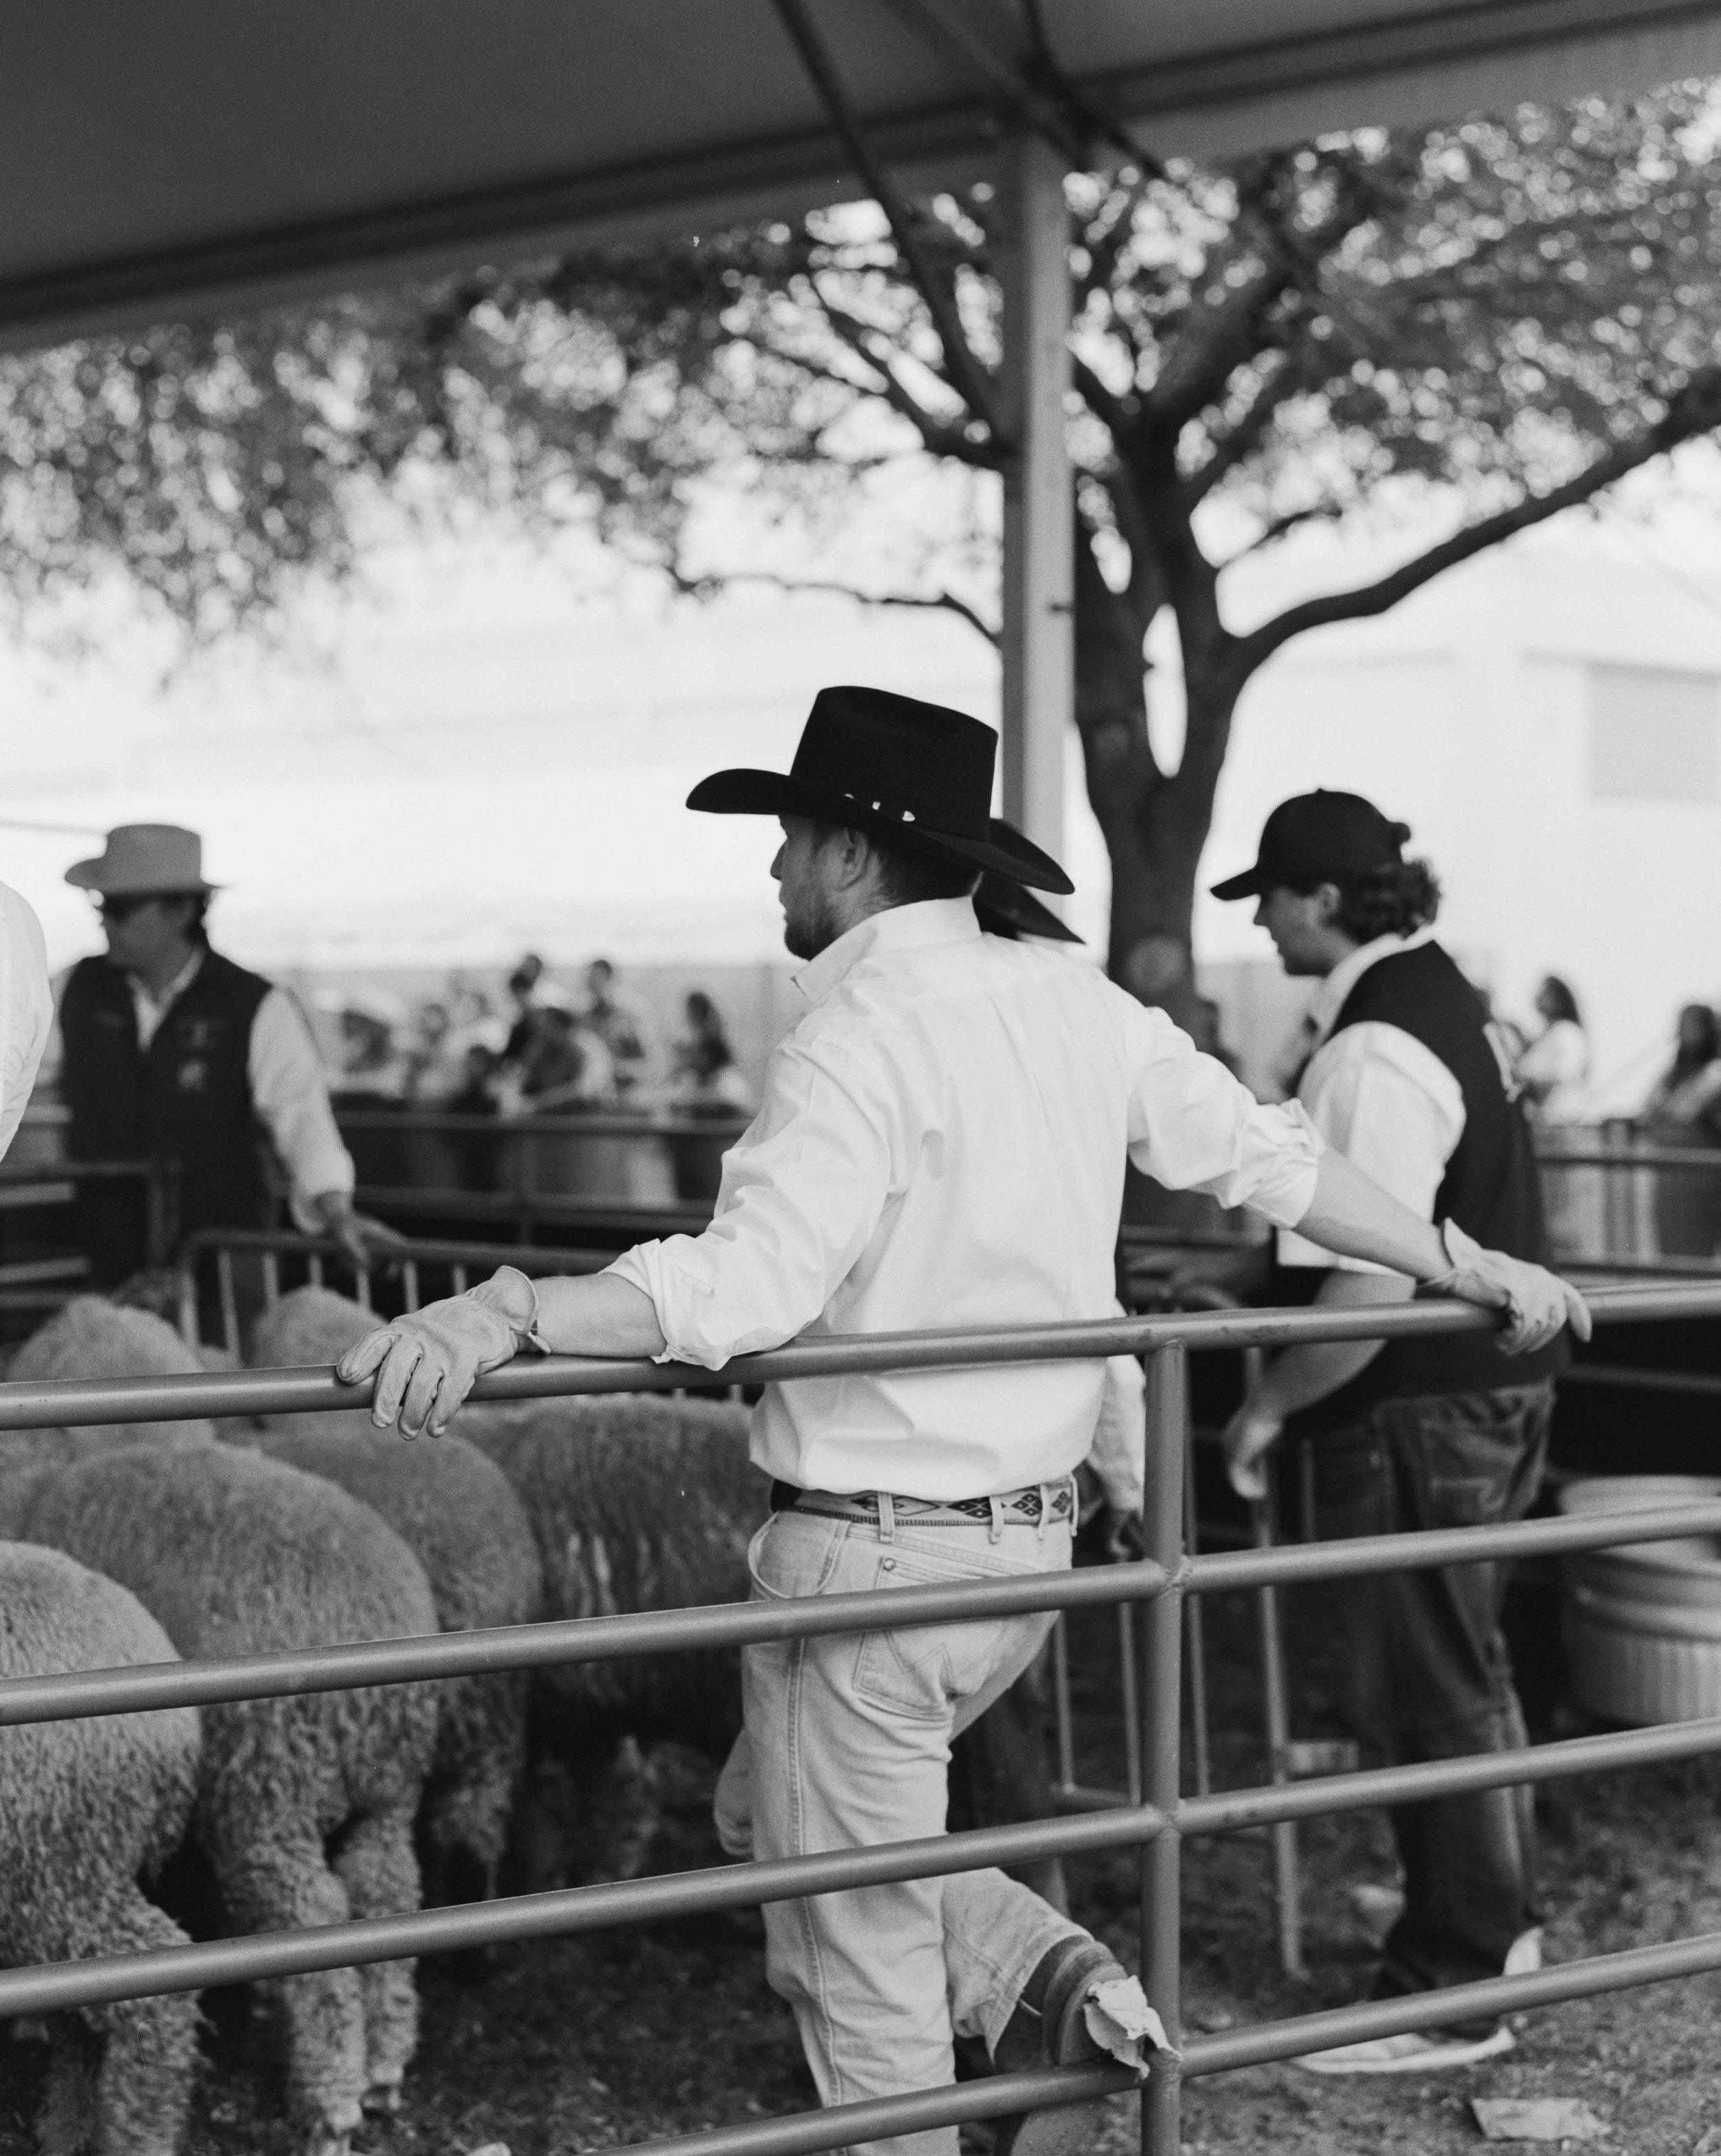 rodeo-5288-400TX-01.jpg